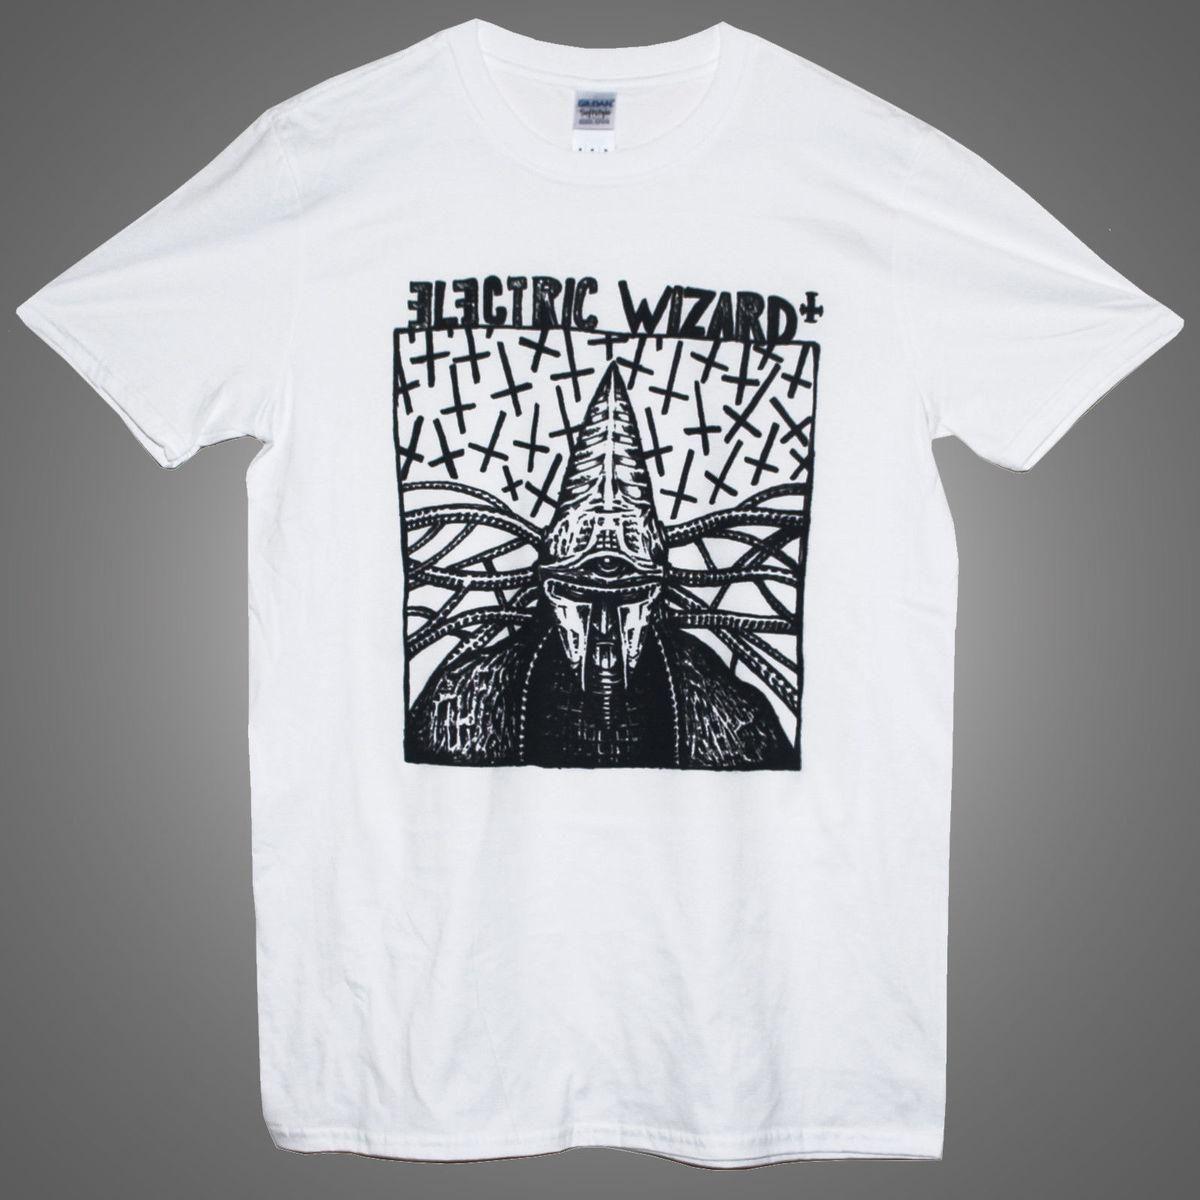 eb2d0d24aedc1 Compre Camiseta Del Mago Eléctrico Camiseta Estampada Stoner Doom Metal  Kyuss Sleep Music Band A  14.67 Del Jie034